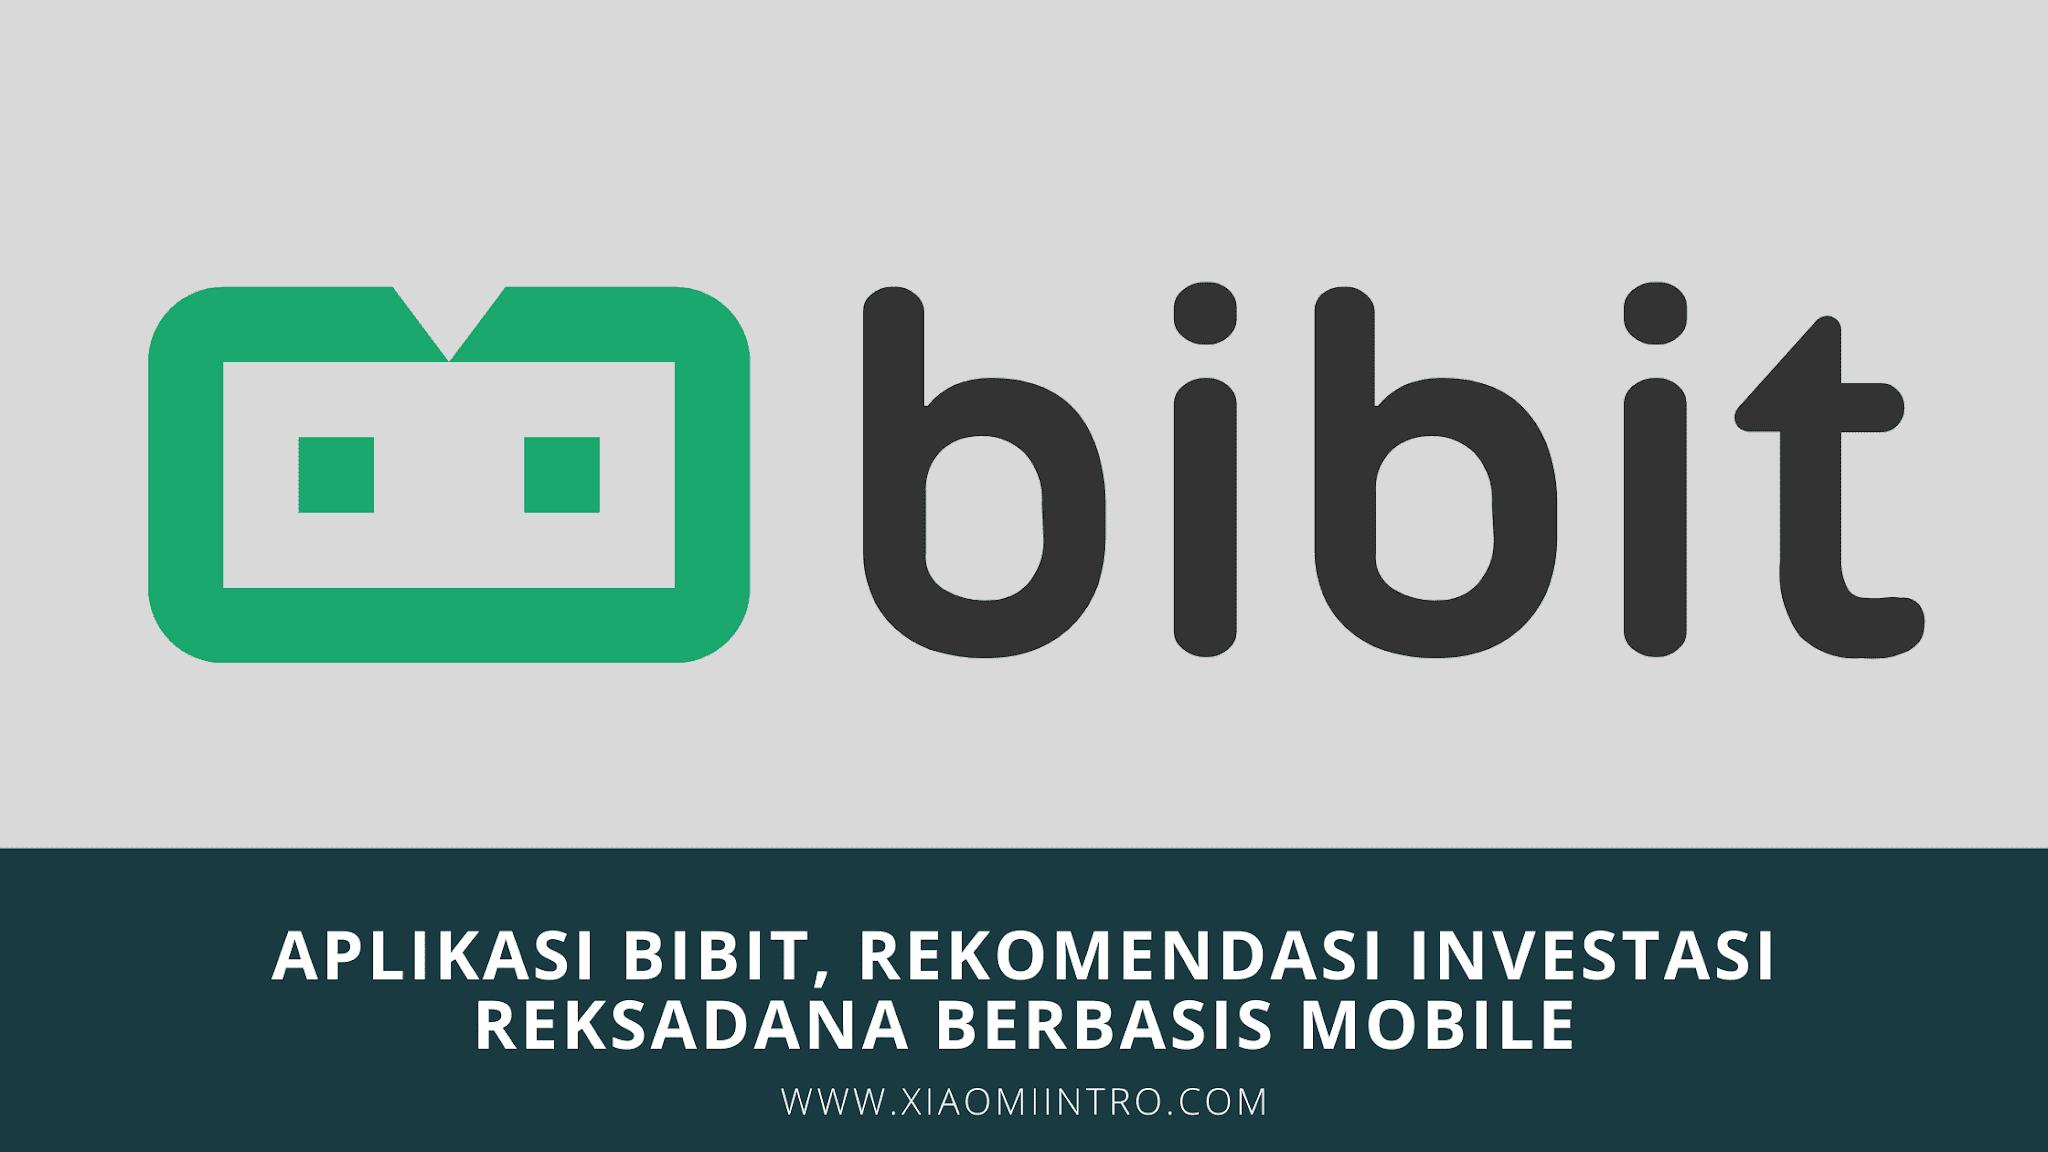 Aplikasi Bibit, Rekomendasi Investasi Reksadana Berbasis Mobile